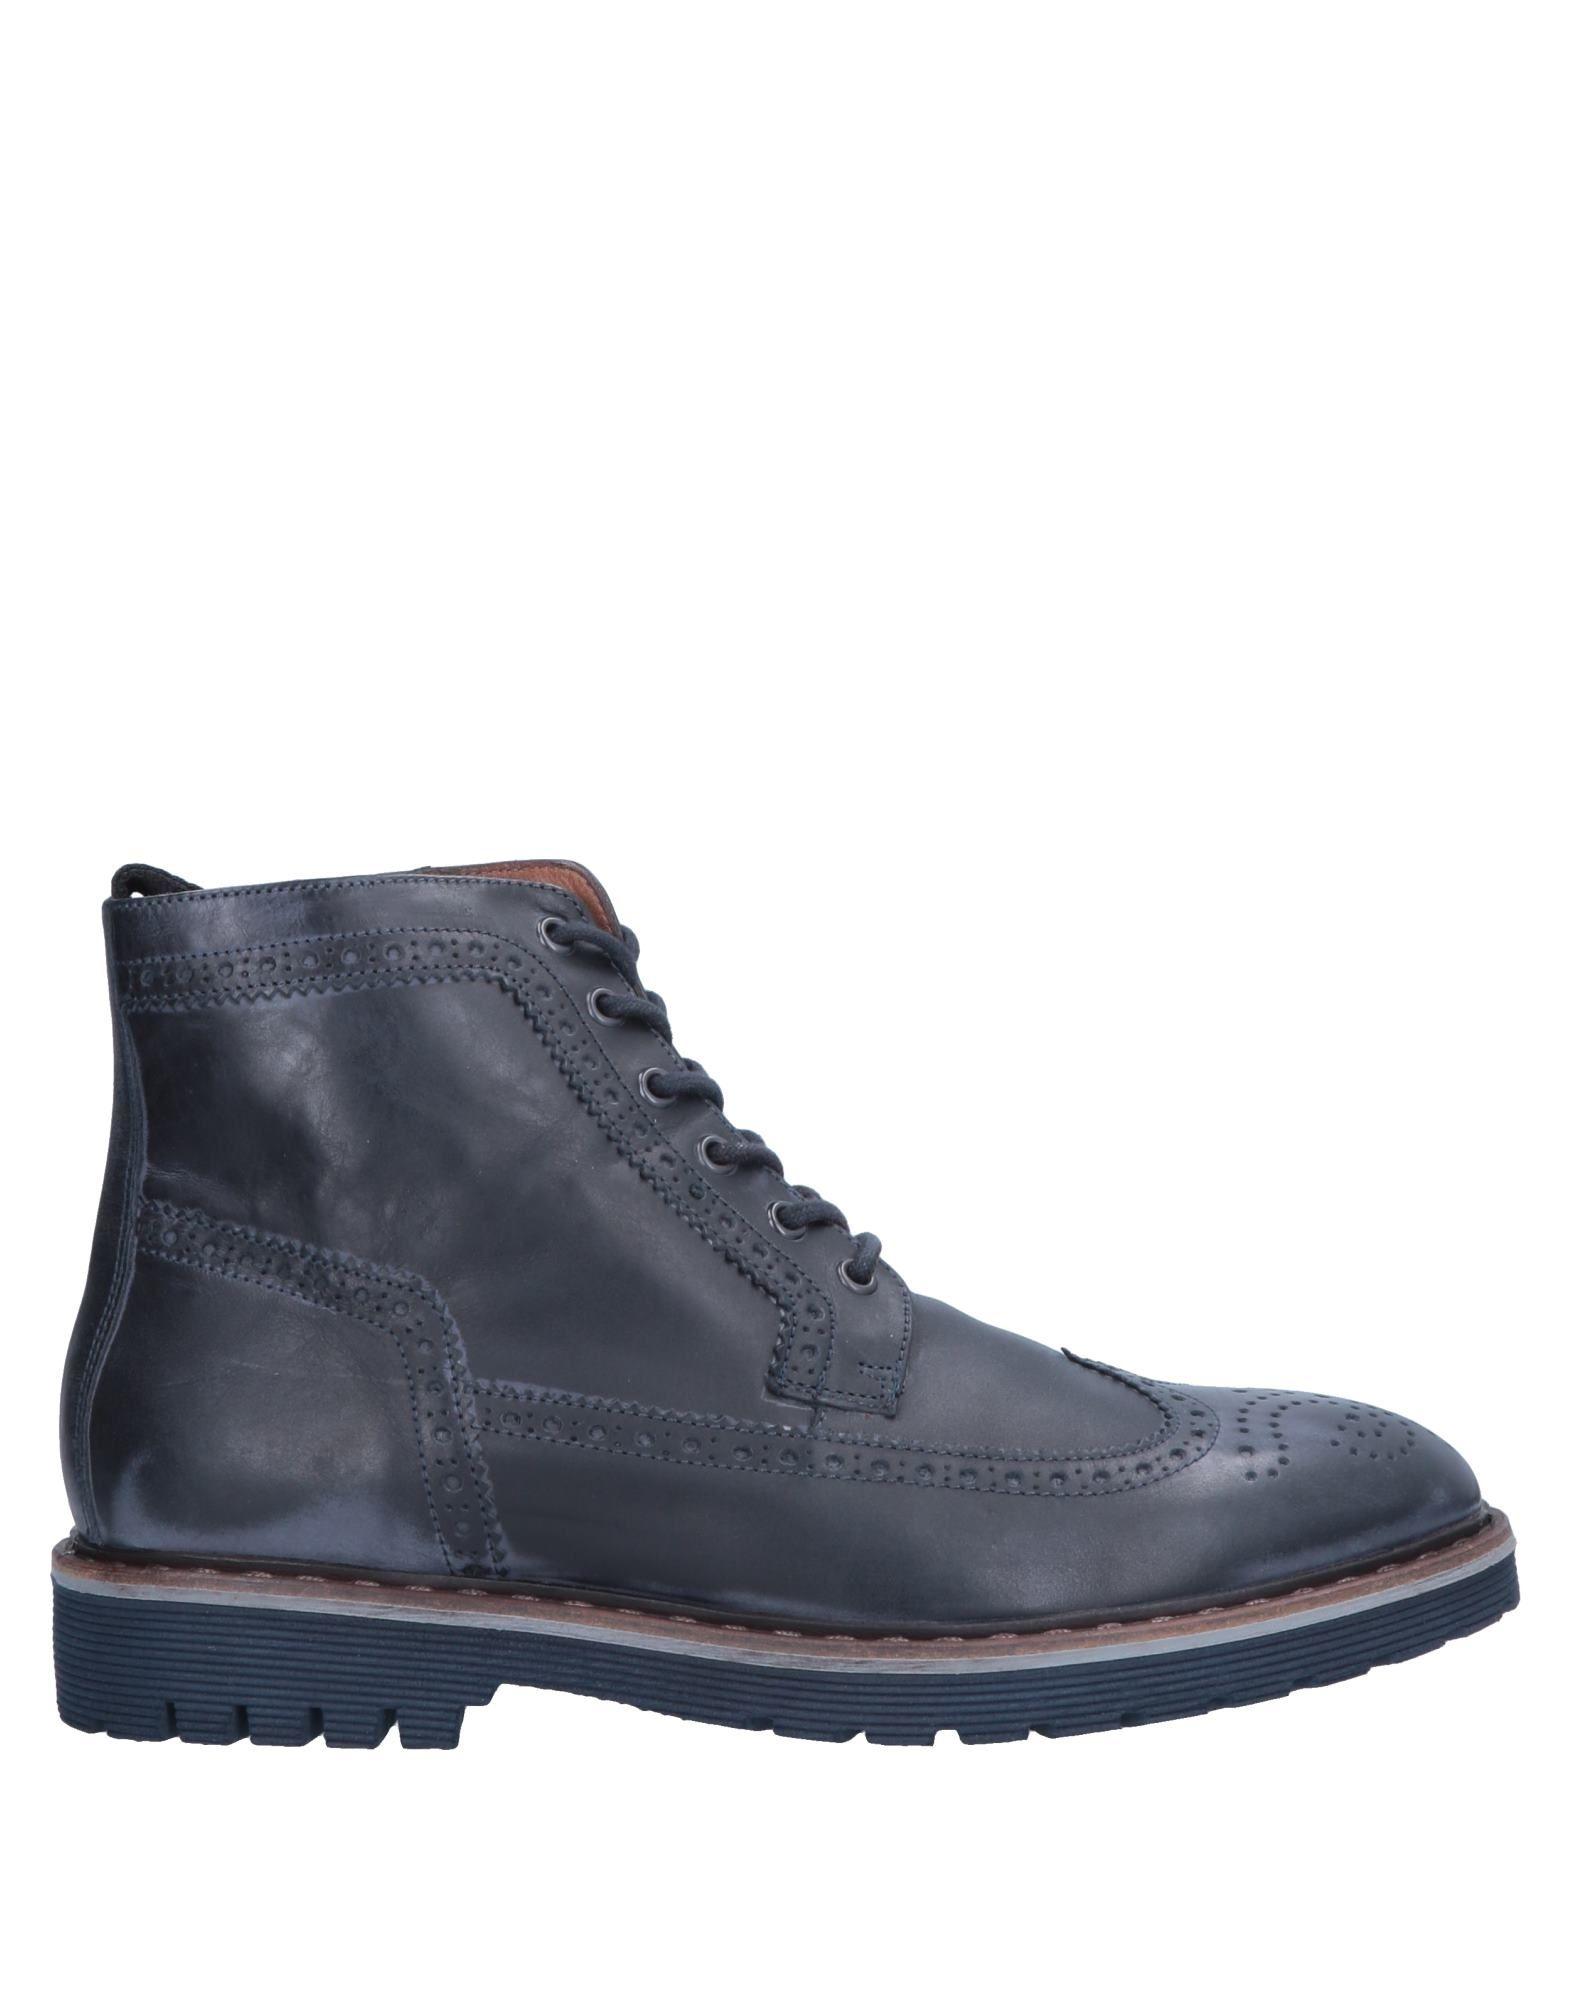 Rabatt echte Schuhe Antica Cuoieria Sneakers Herren  11556966SH